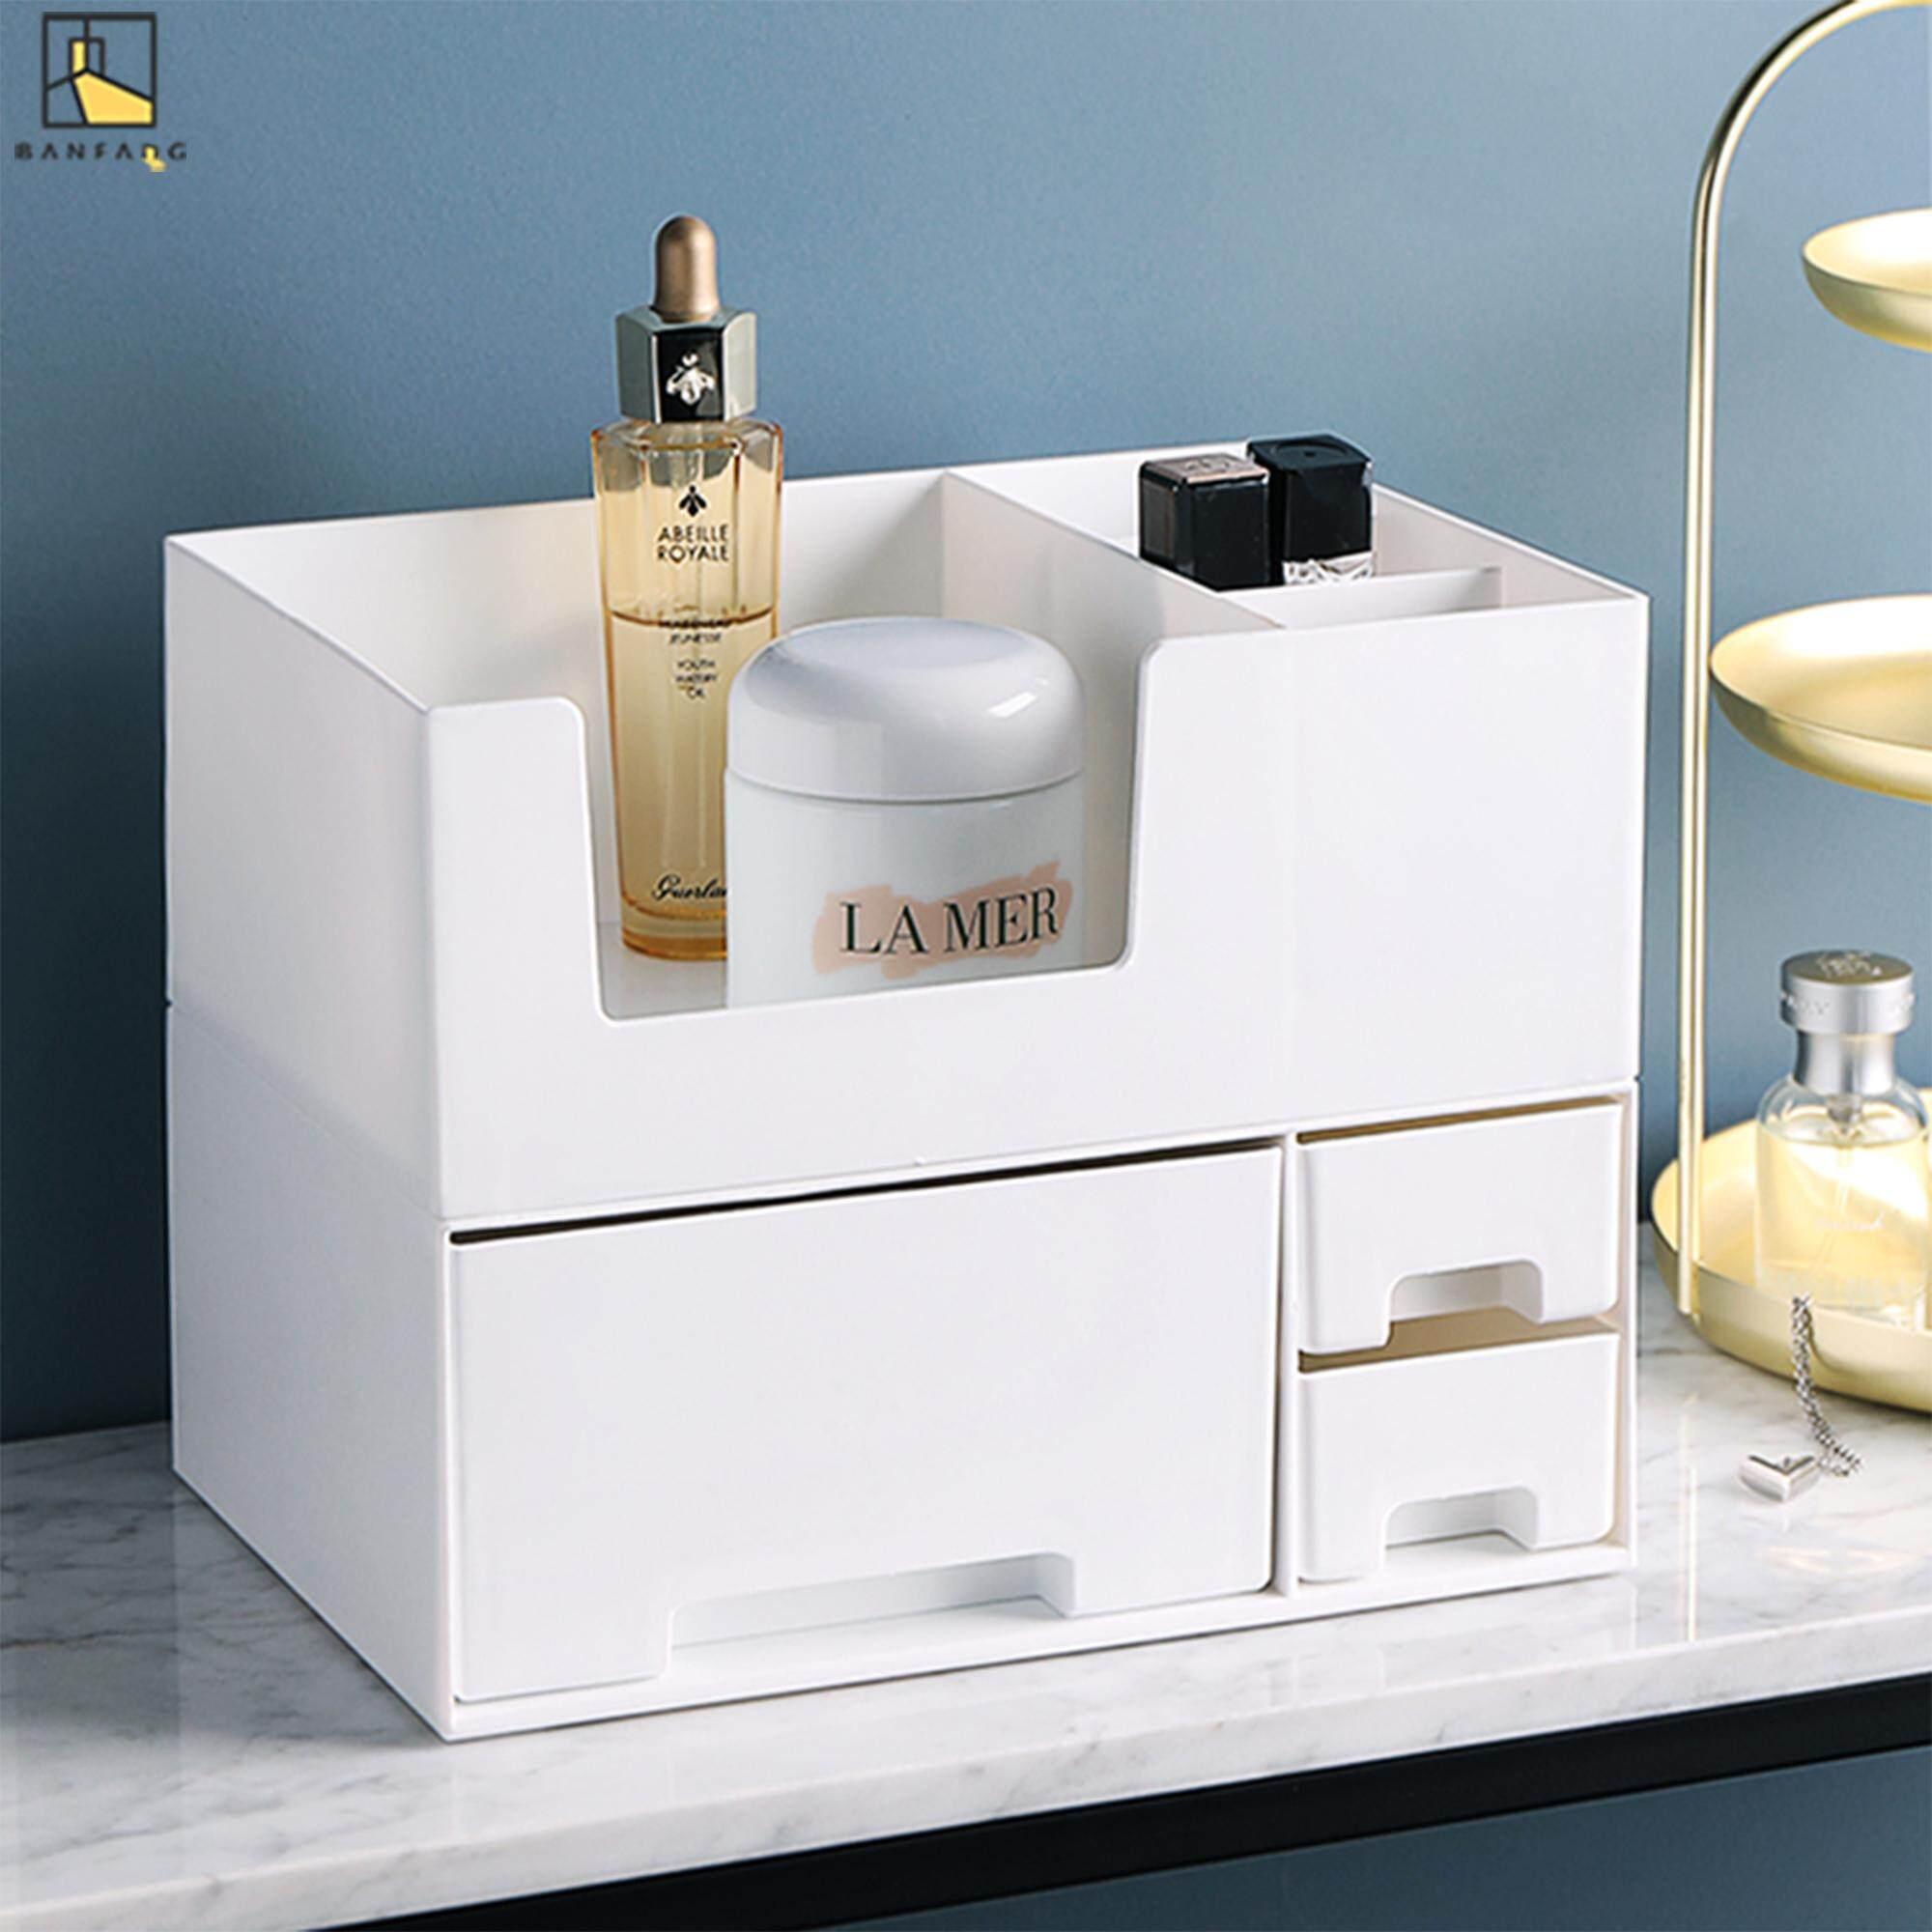 BANFANG Pp plastic cosmetic storage box lipstick jewelry storage box multi-functional desktop double drawer storage box